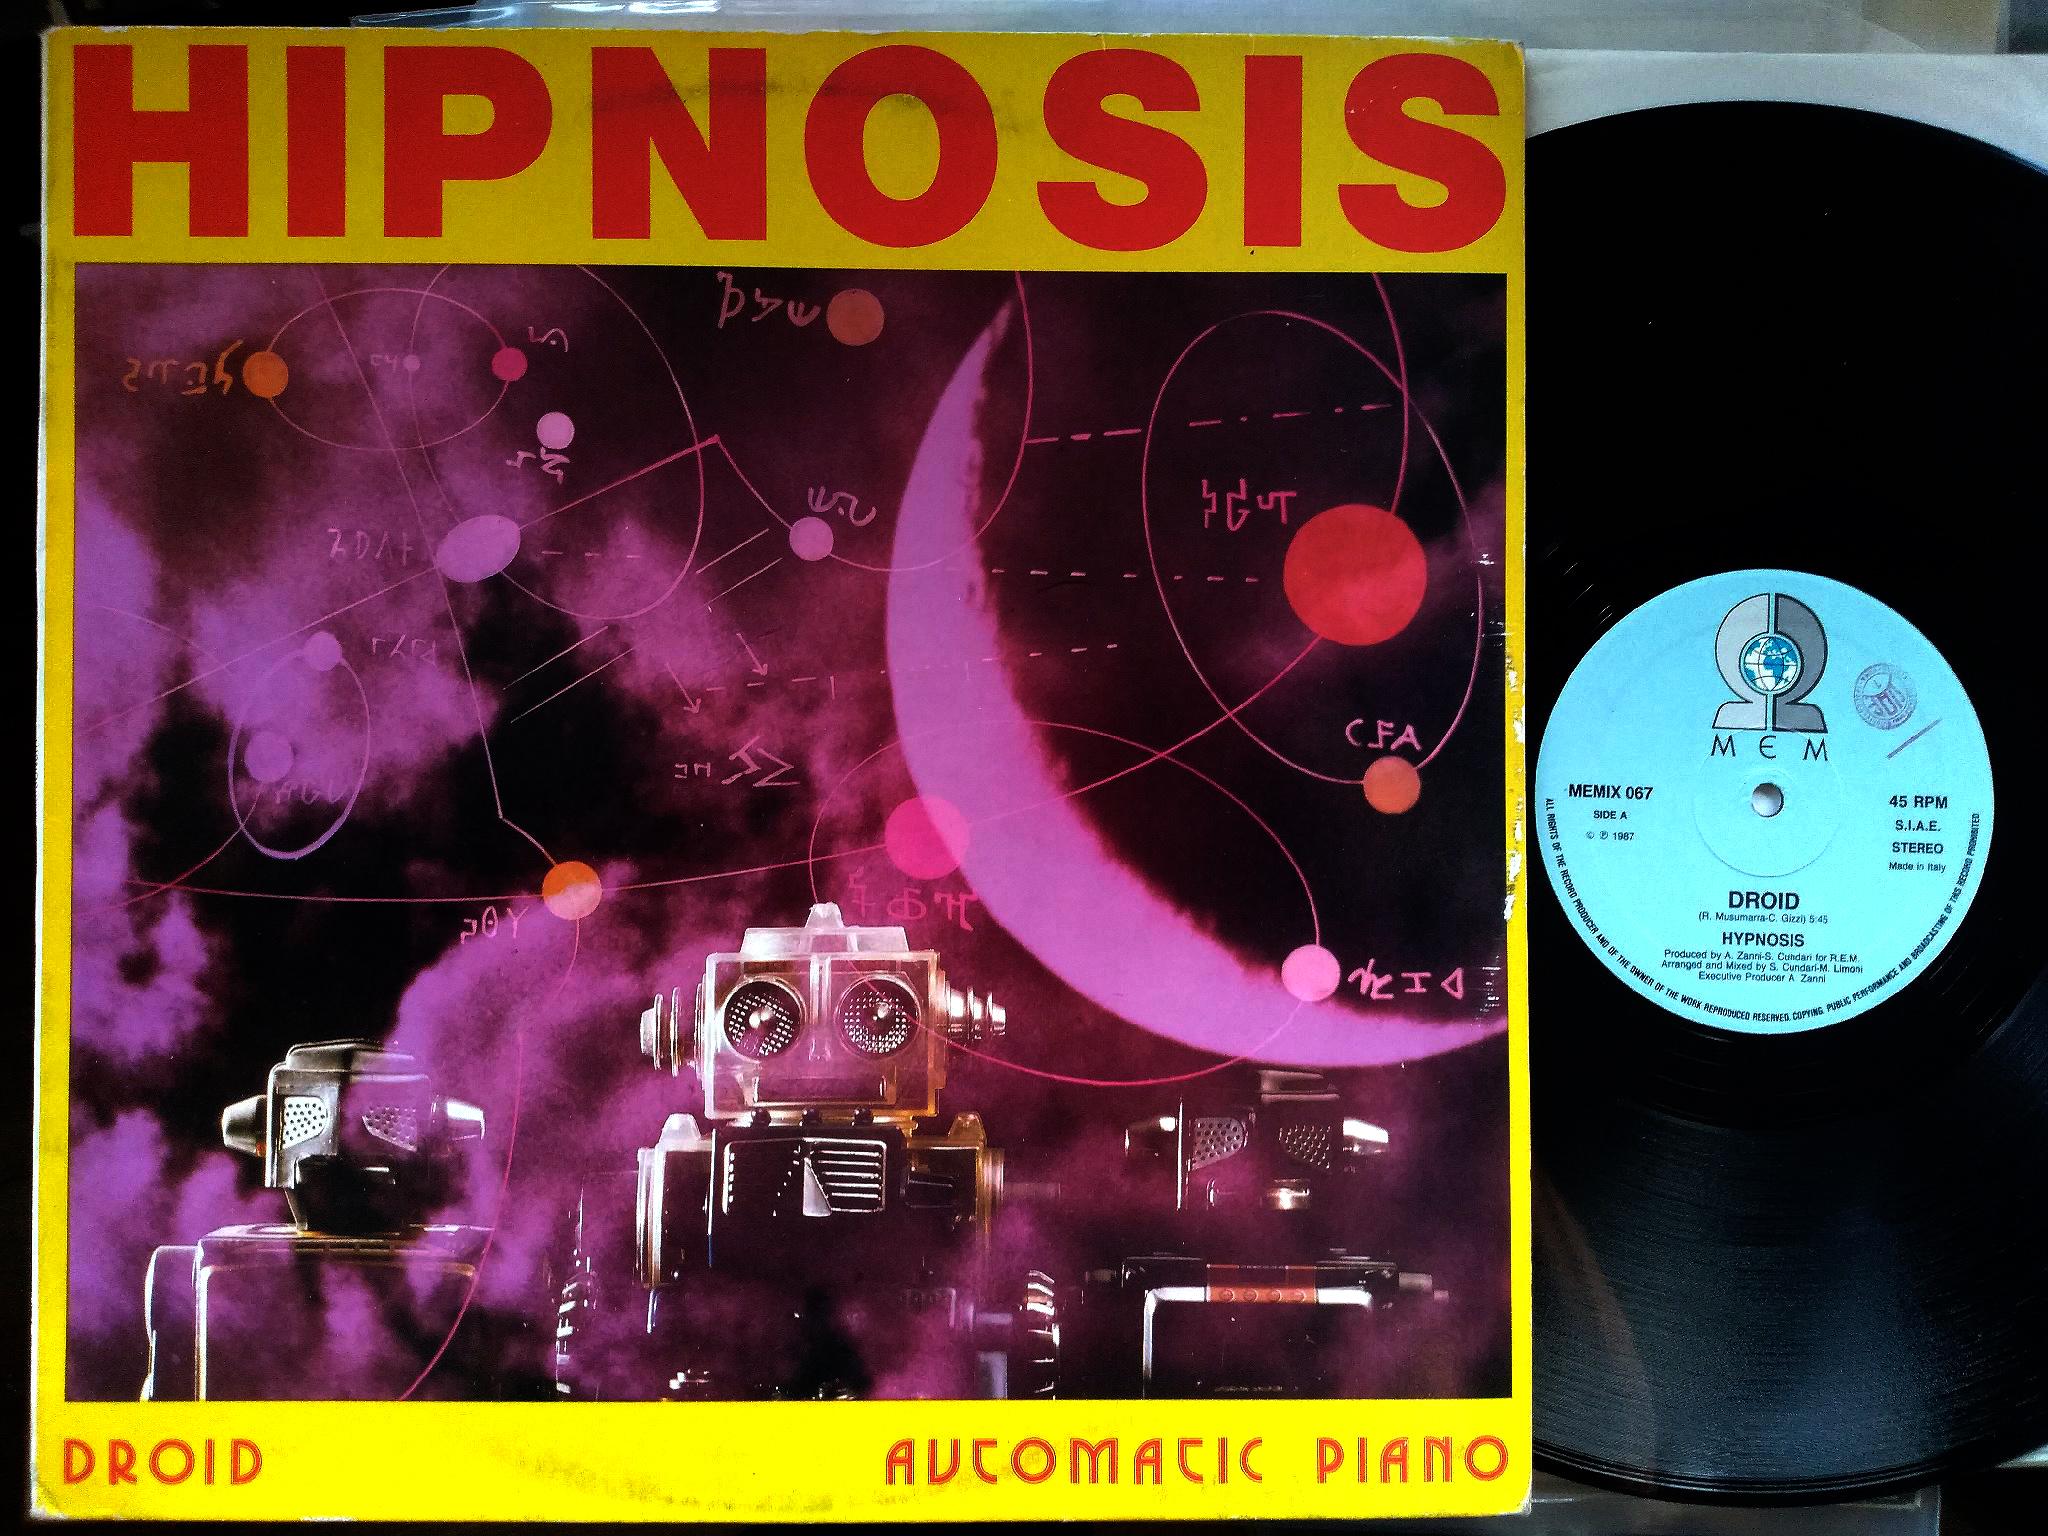 Hipnosis - Automatic Piano